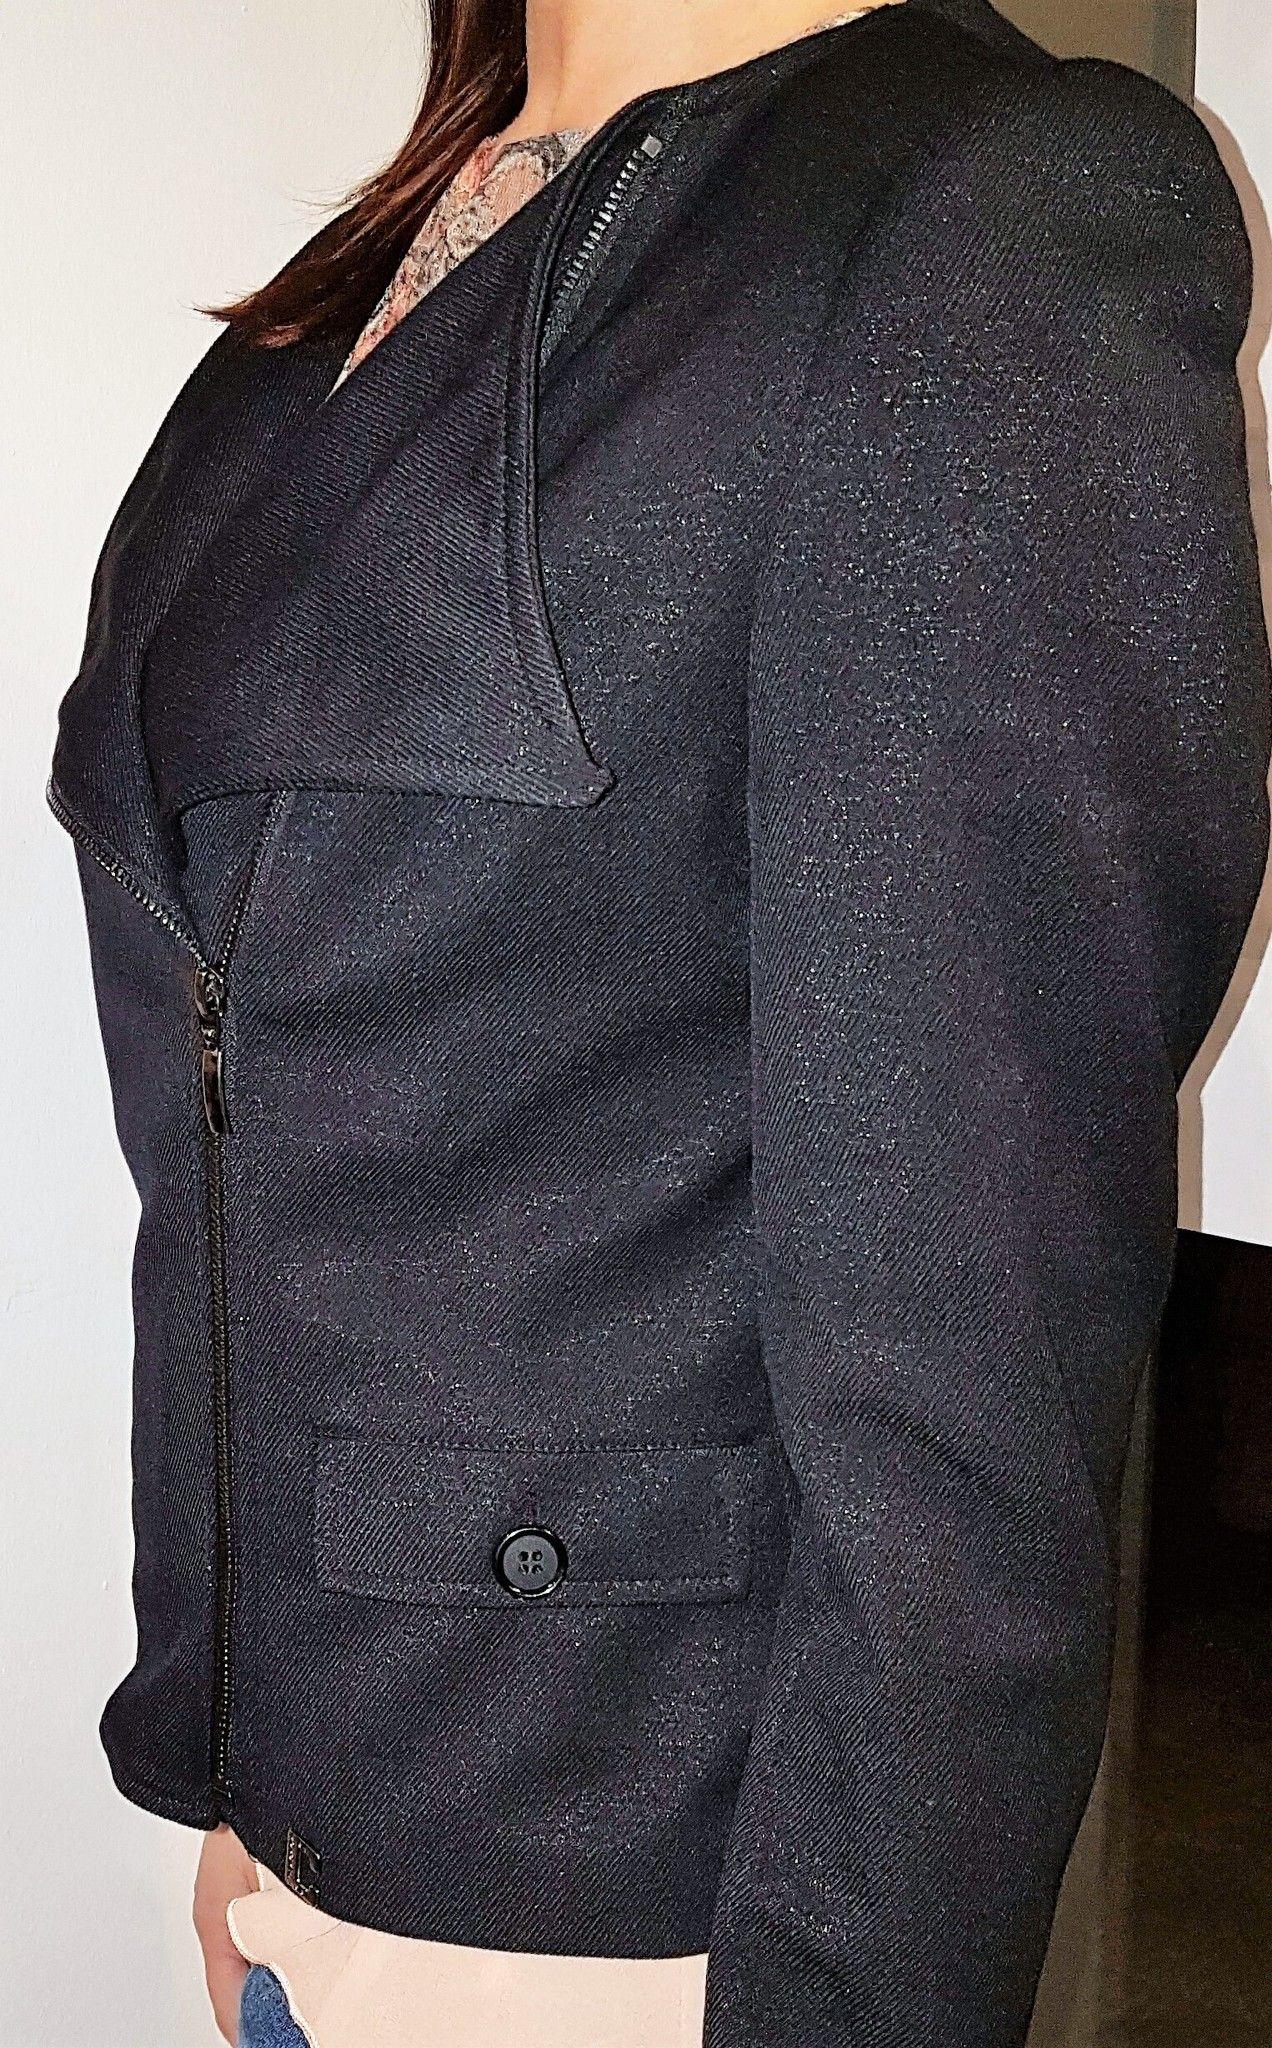 size 40 20a1d b0e74 Giacca Chiodo Coconuda   Giacche e Completi   Shop Online: Koco'  Abbigliamento Donna